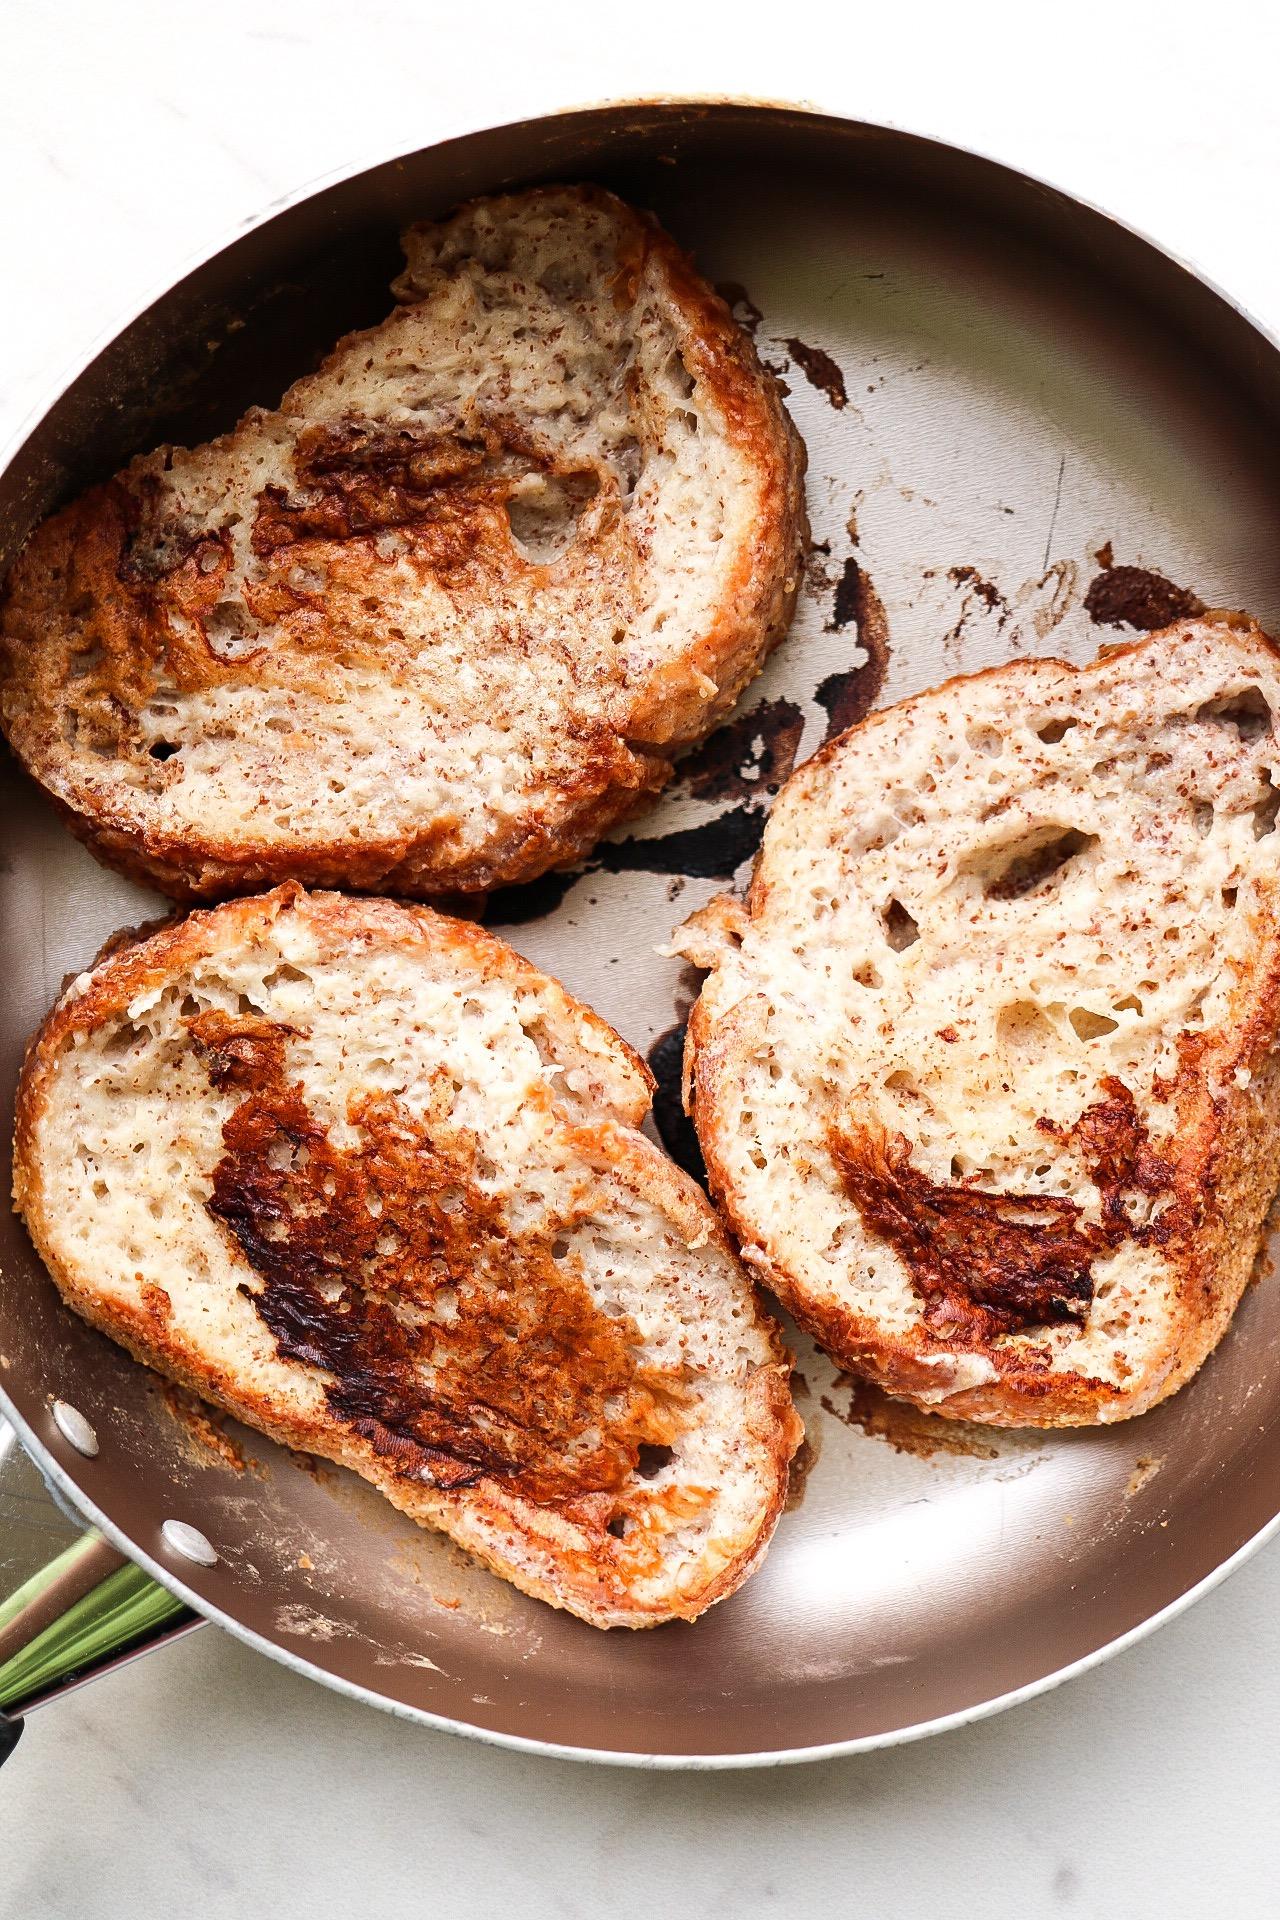 Cook until golden brown :)